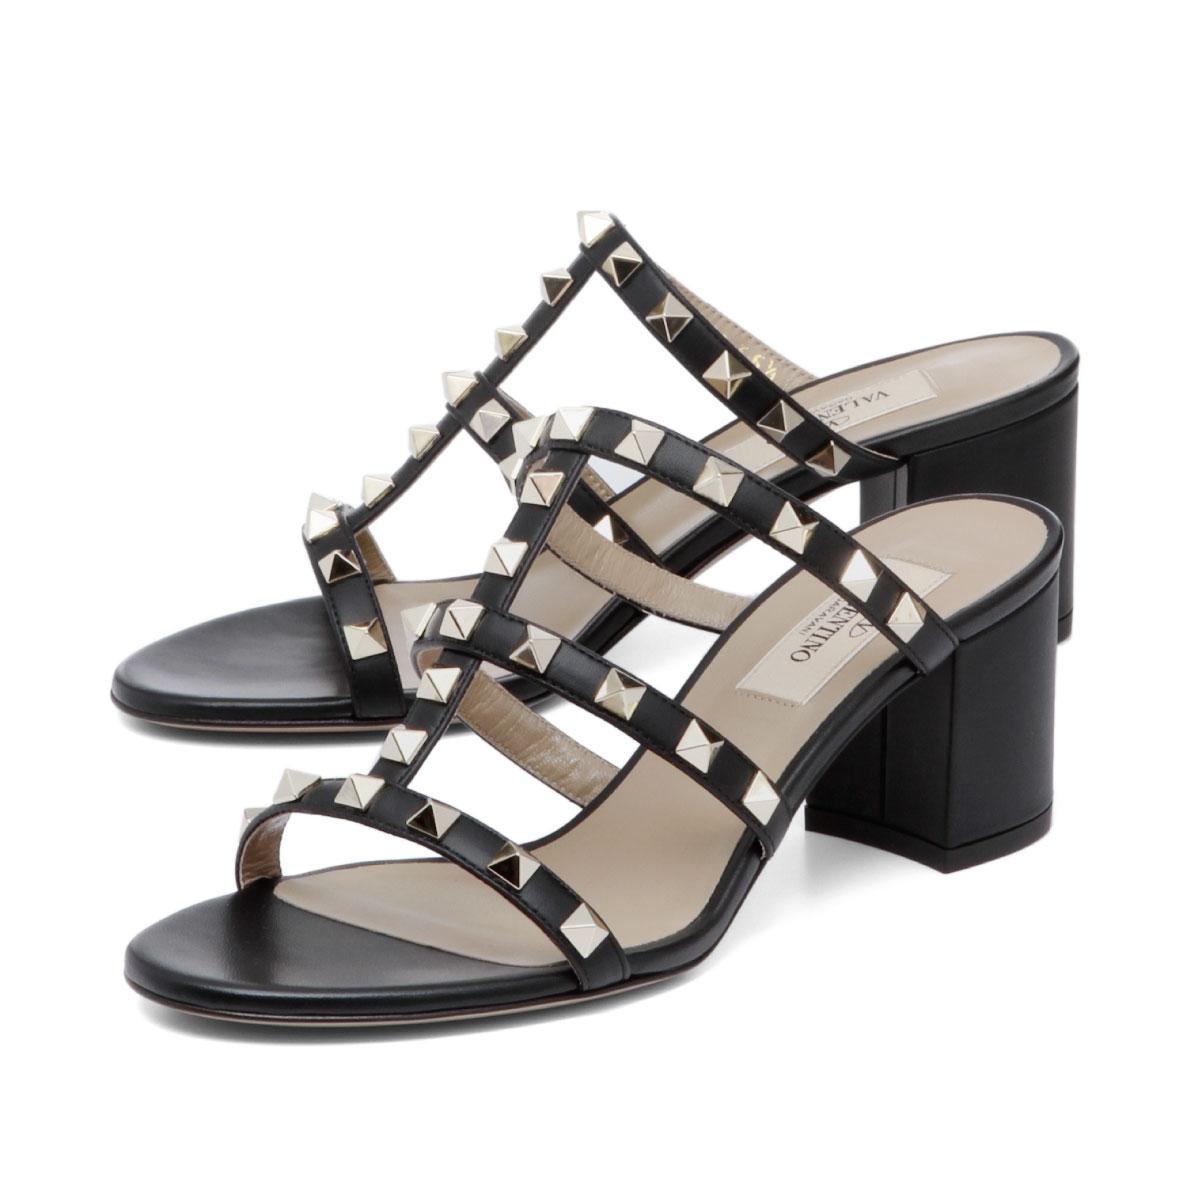 c5b84fe99dc importshopdouble: Valentino VALENTINO shoes Lady's RW2S0C47 VOD 0NO sandals  ROCKSTUD lock stud bolt NERO/NER black | Rakuten Global Market